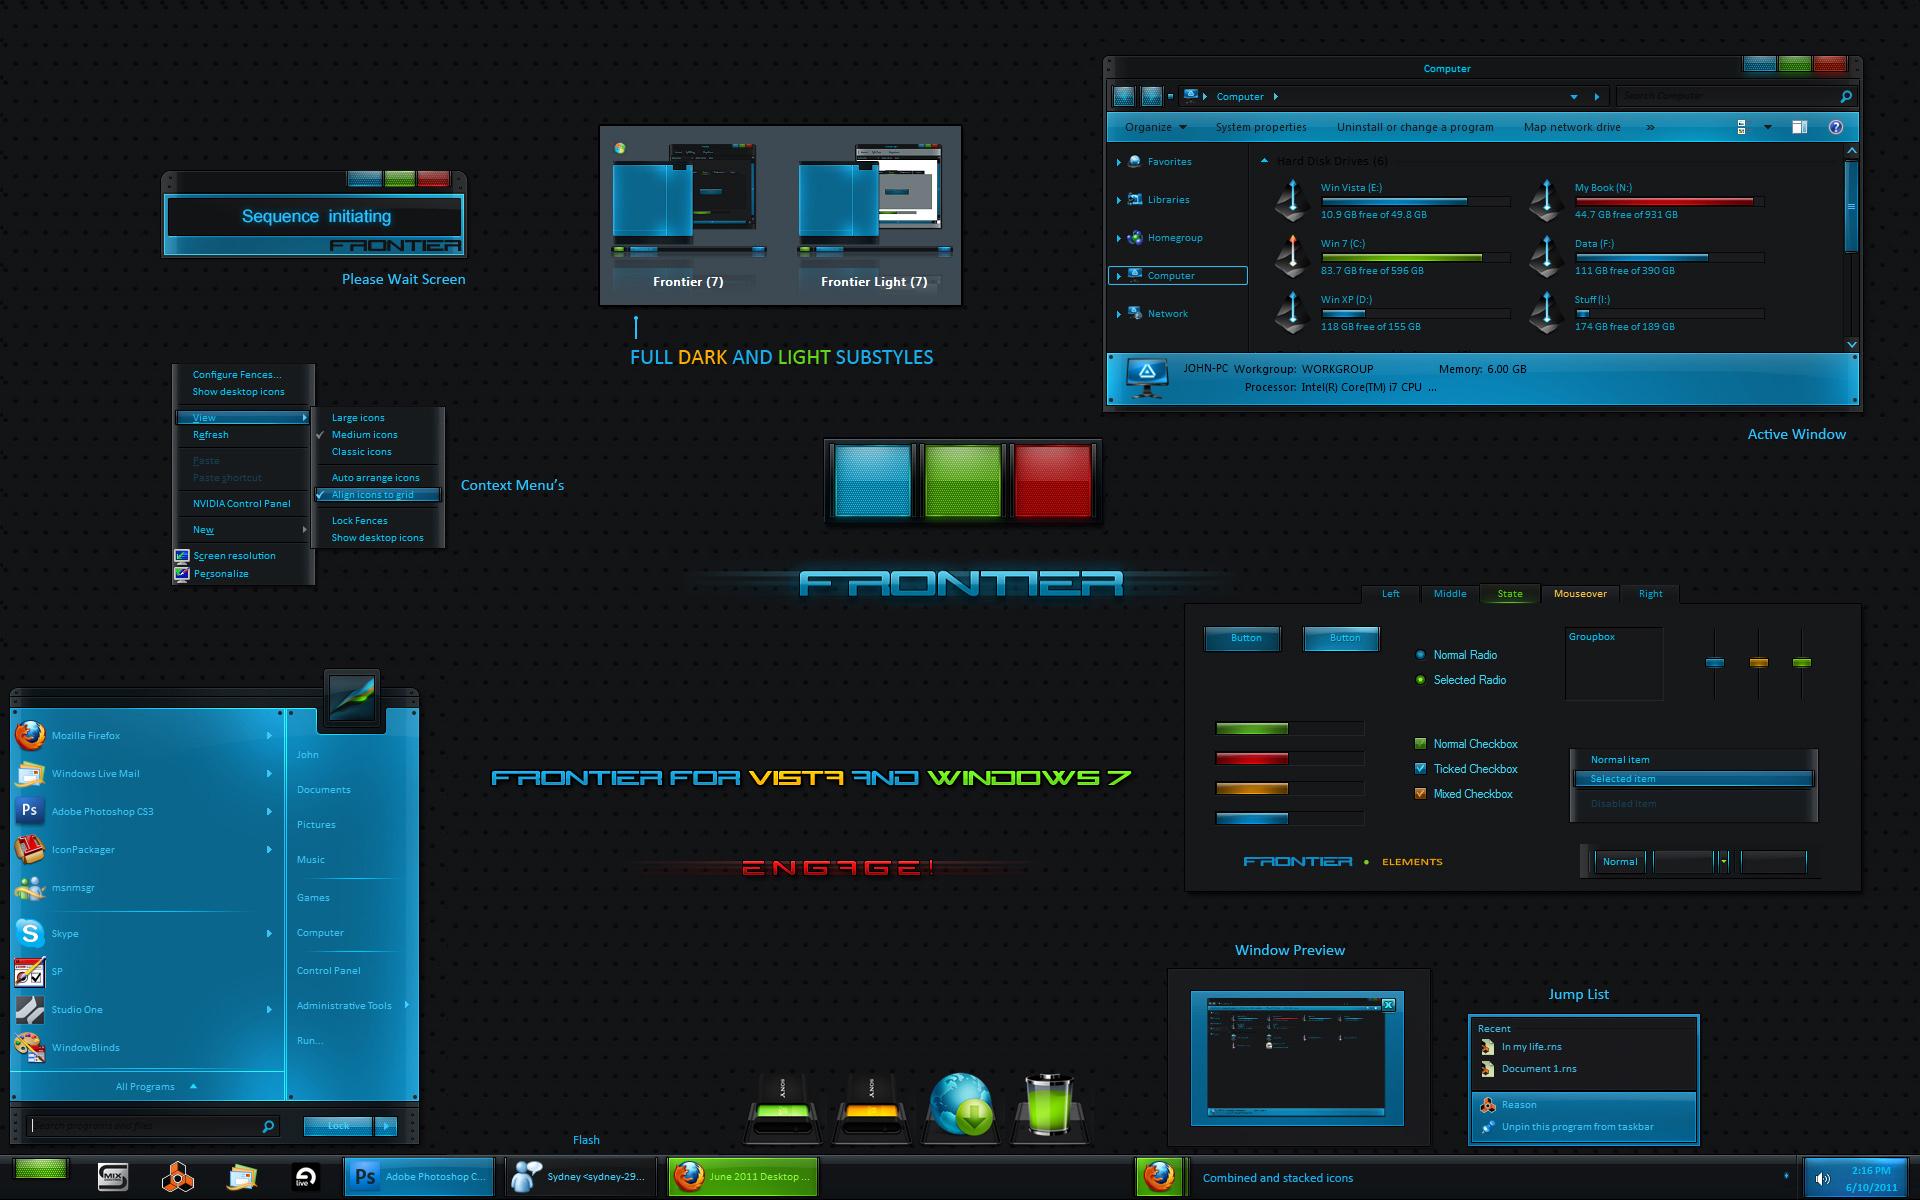 Window blinds 8 theme windows 7 netbooks with windowblinds 7 forum.